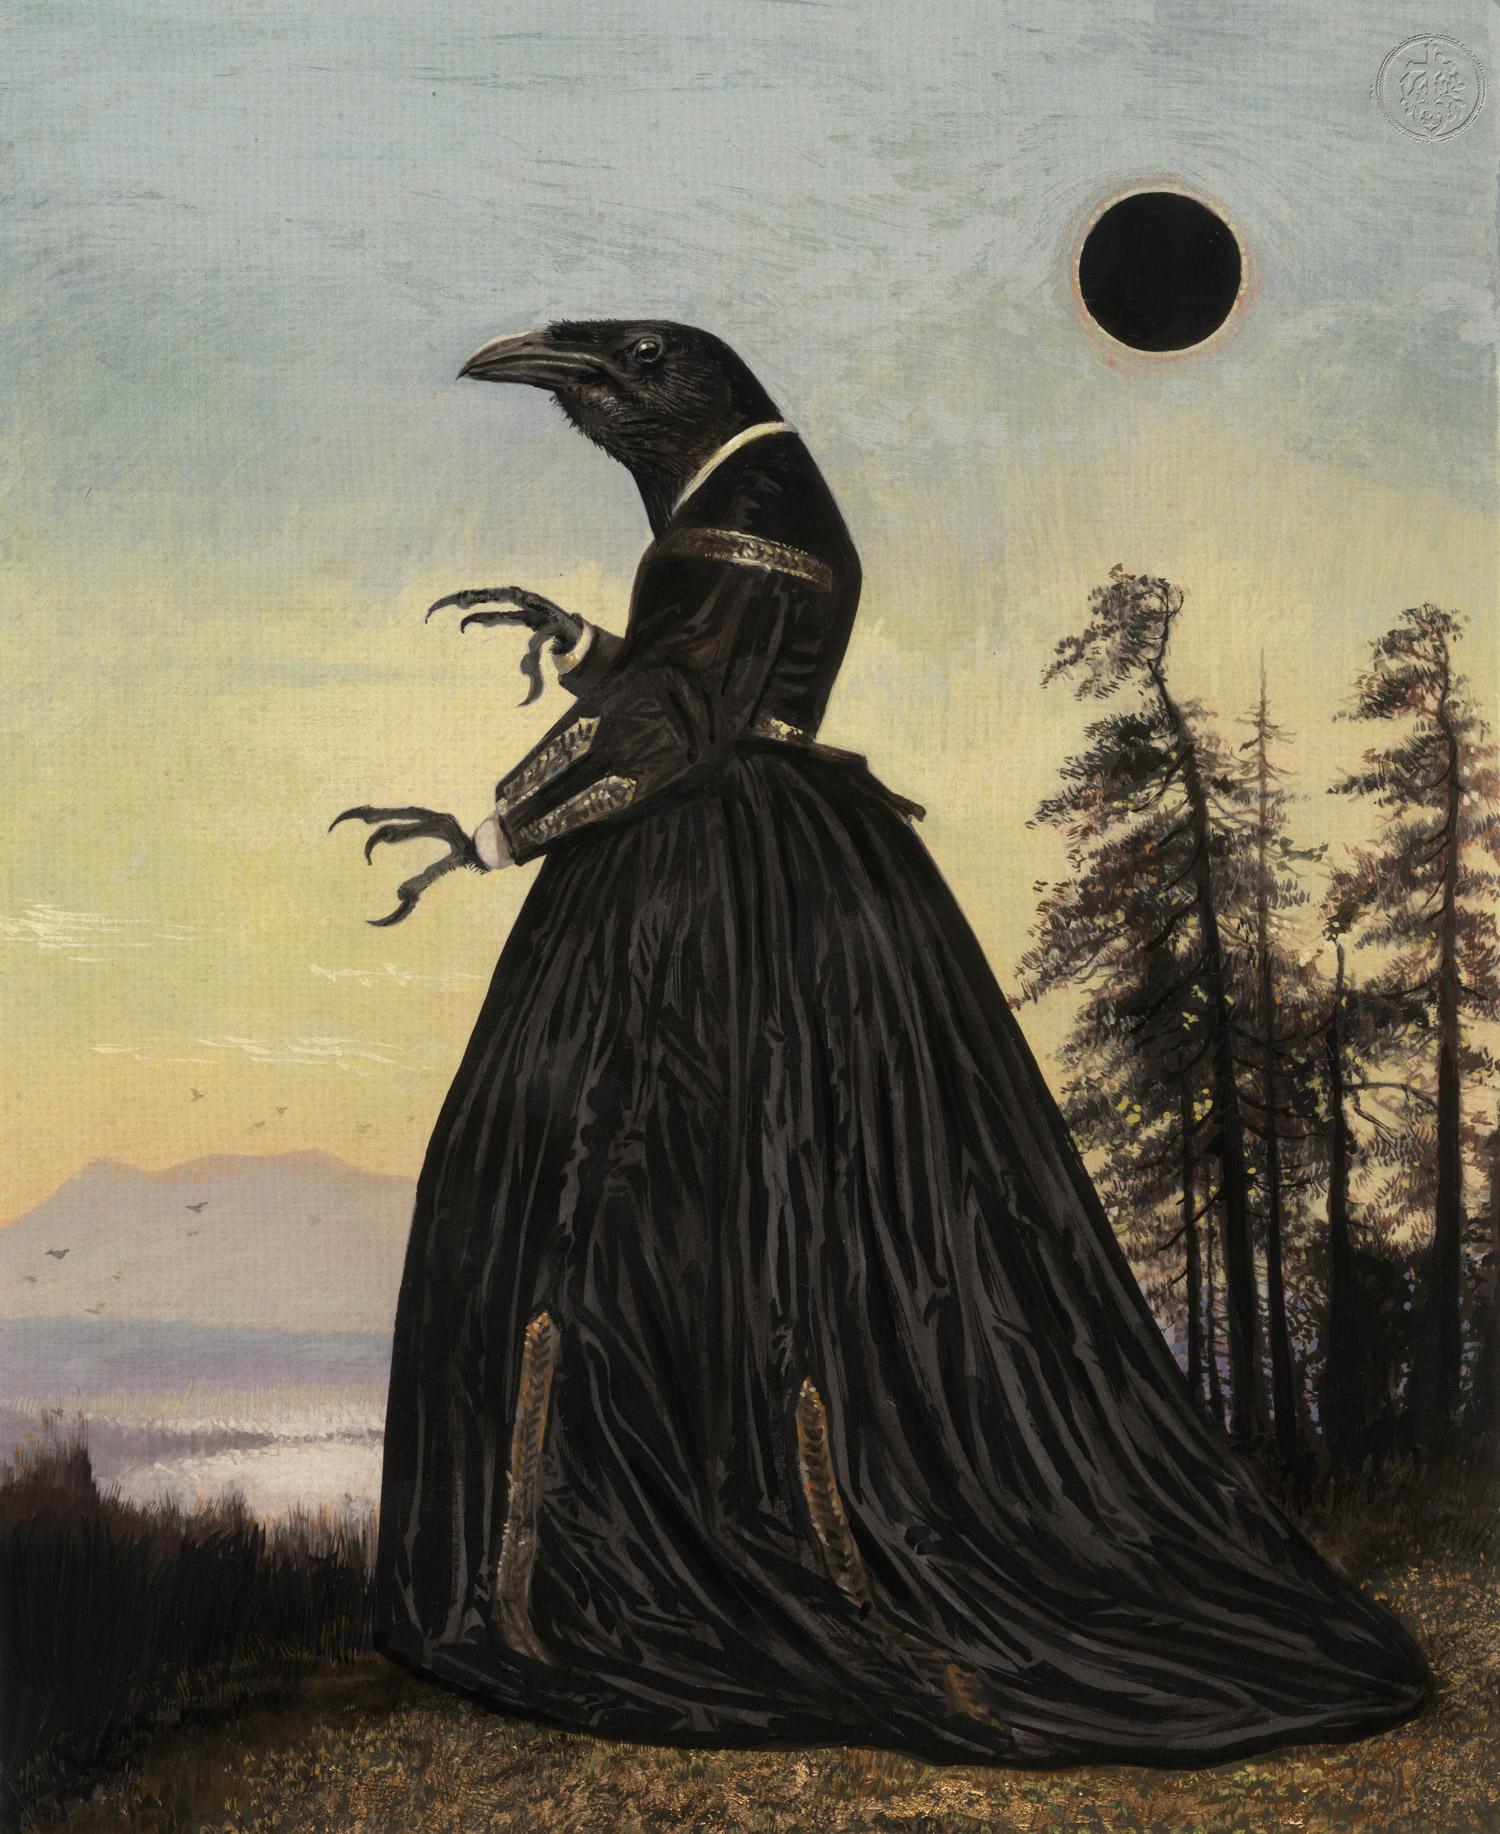 Bill Mayer - The Black Sun